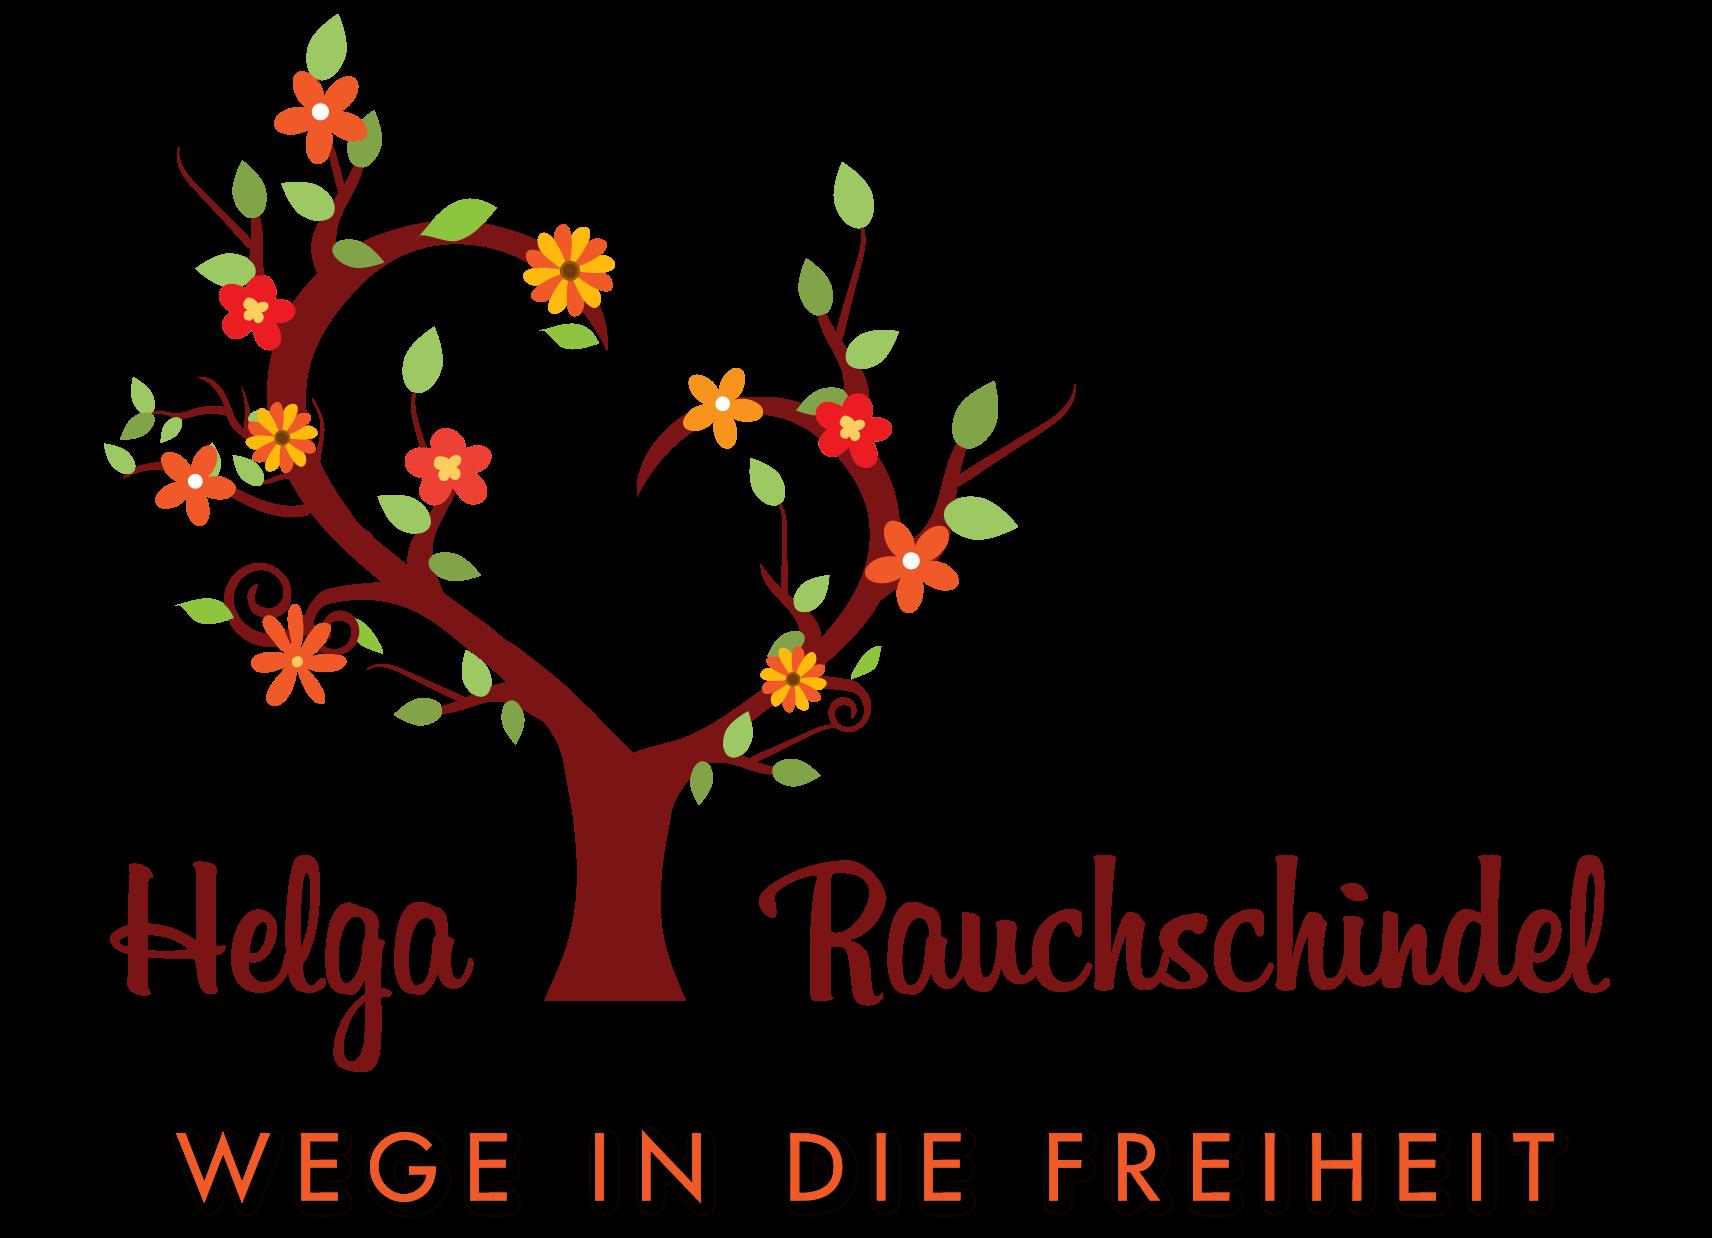 Helga Rauchschindel - Dualseelen & Seelenpartner